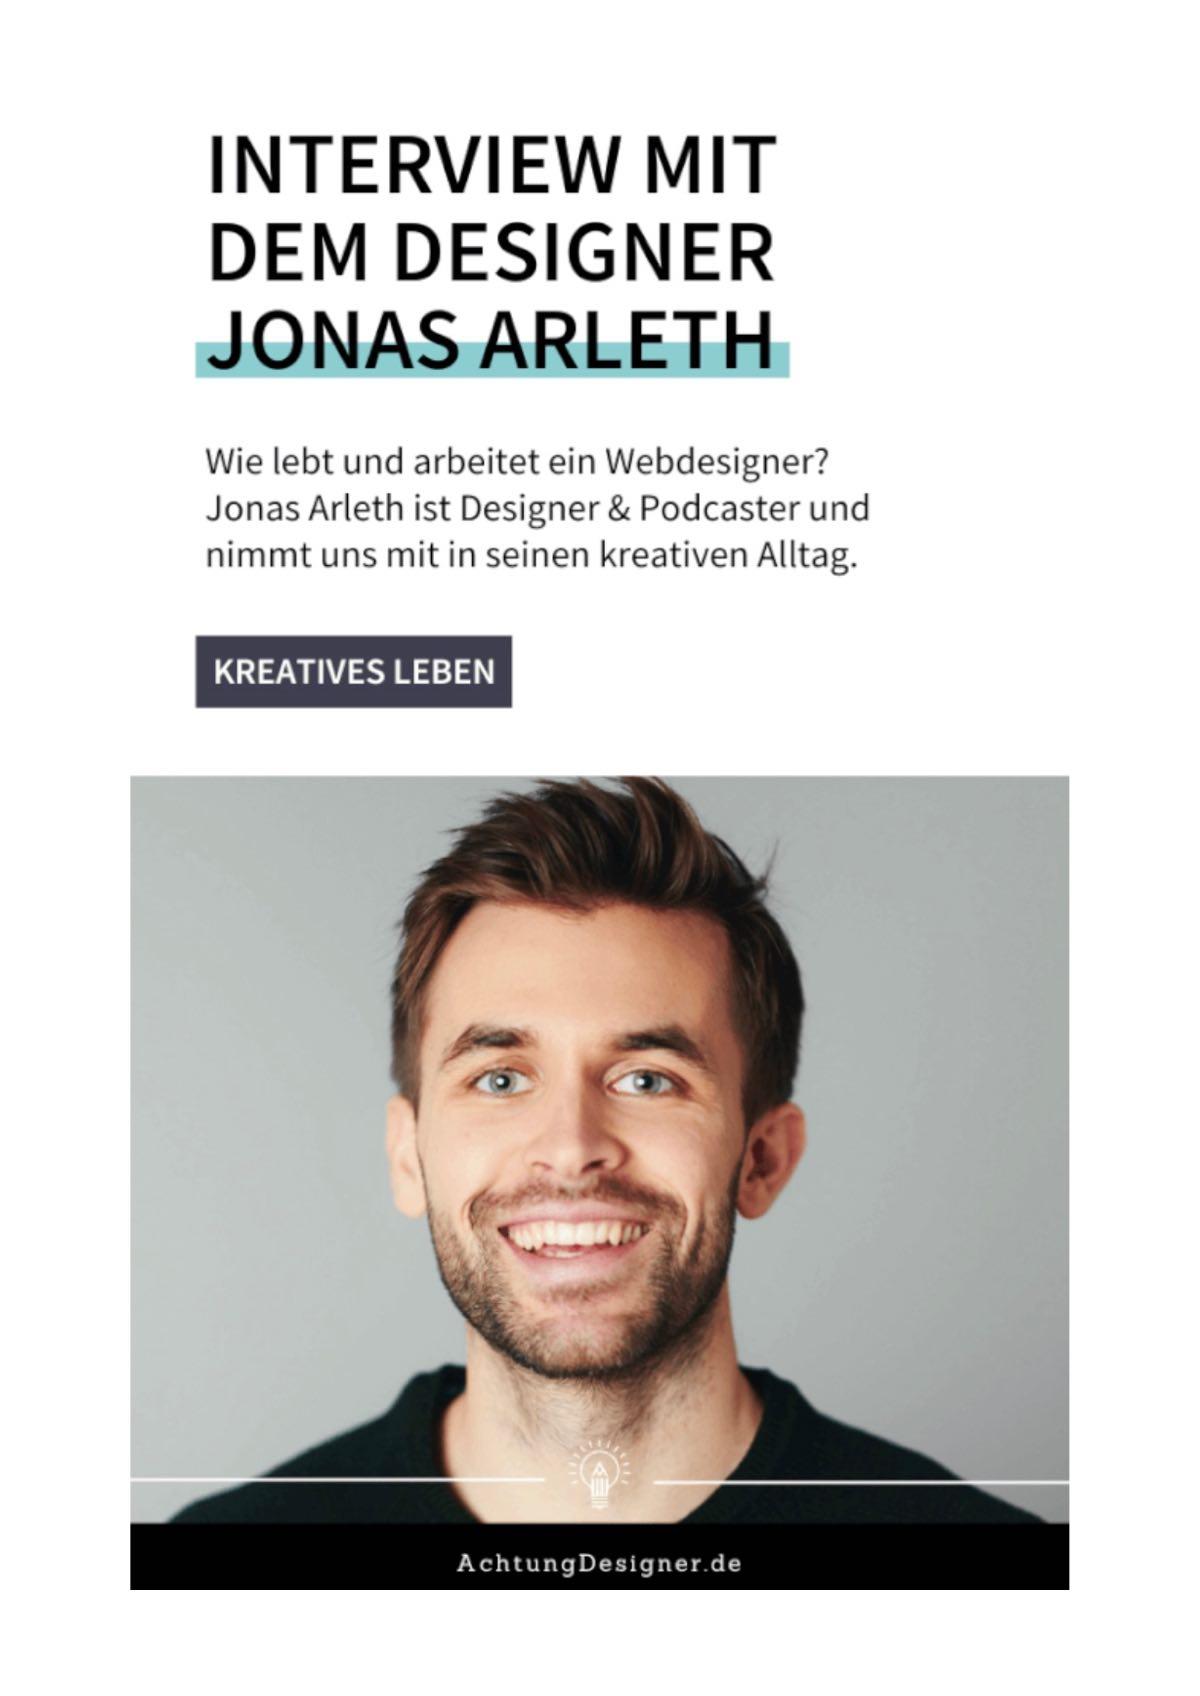 Teaser Blog Interview bei Achtung Designer